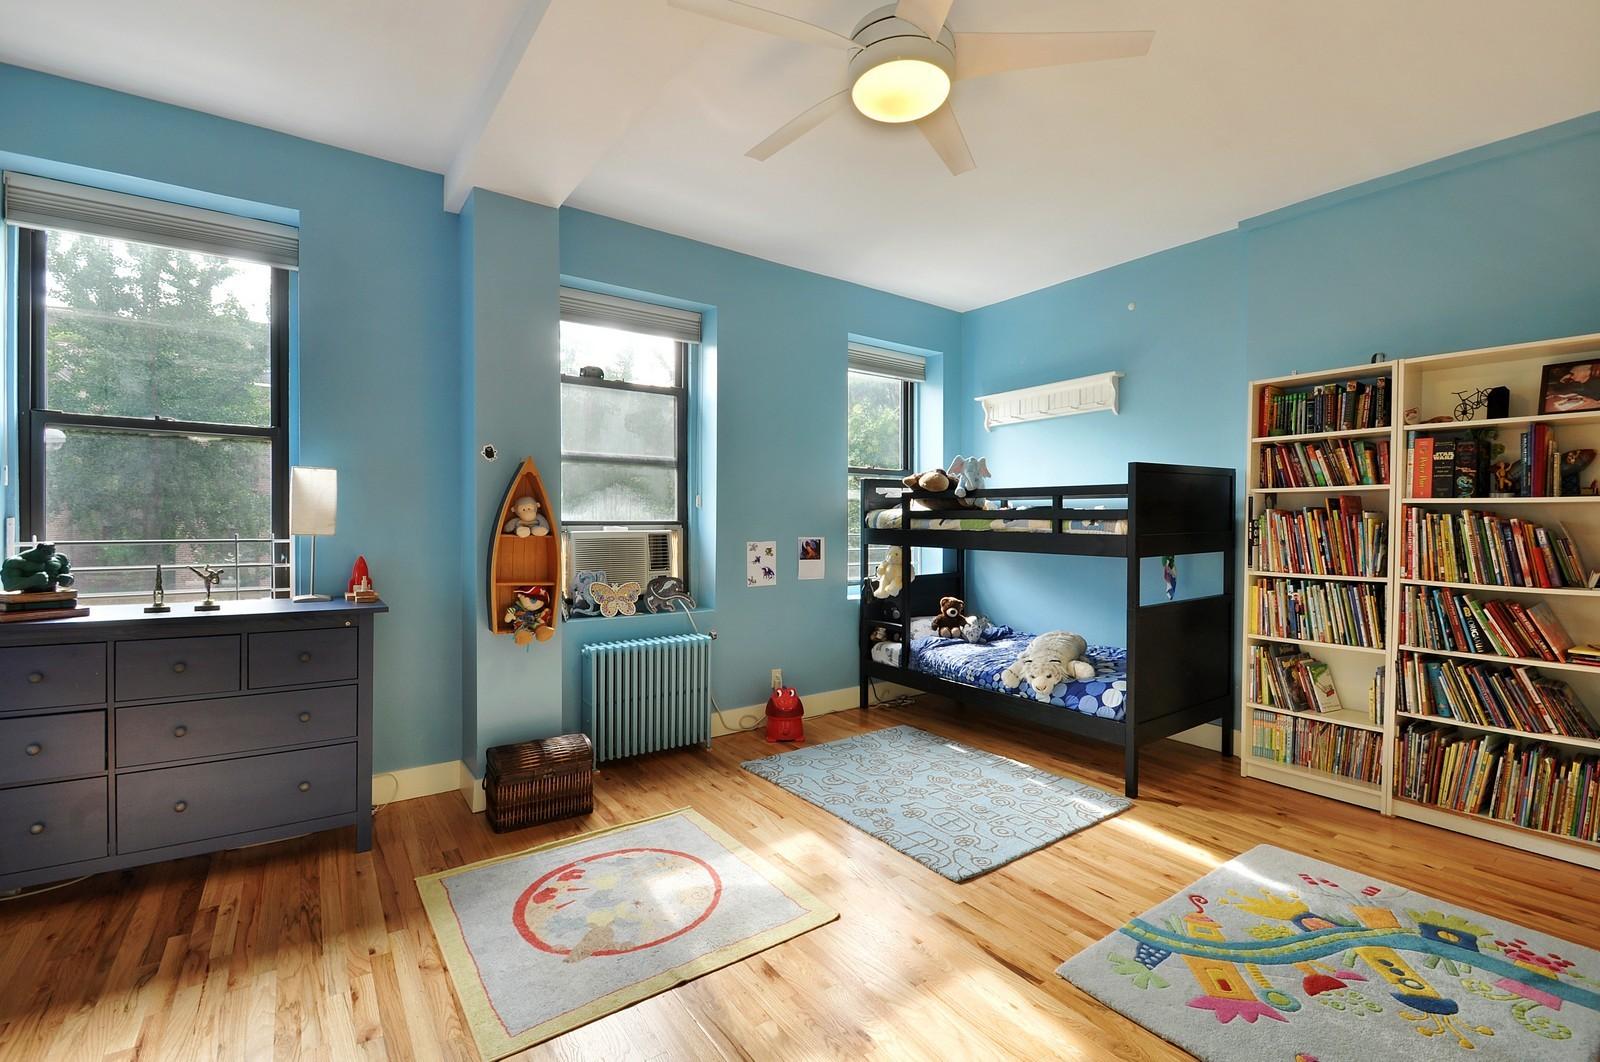 Corcoran, 55 West 130th Street, Harlem Real Estate, Manhattan For ...